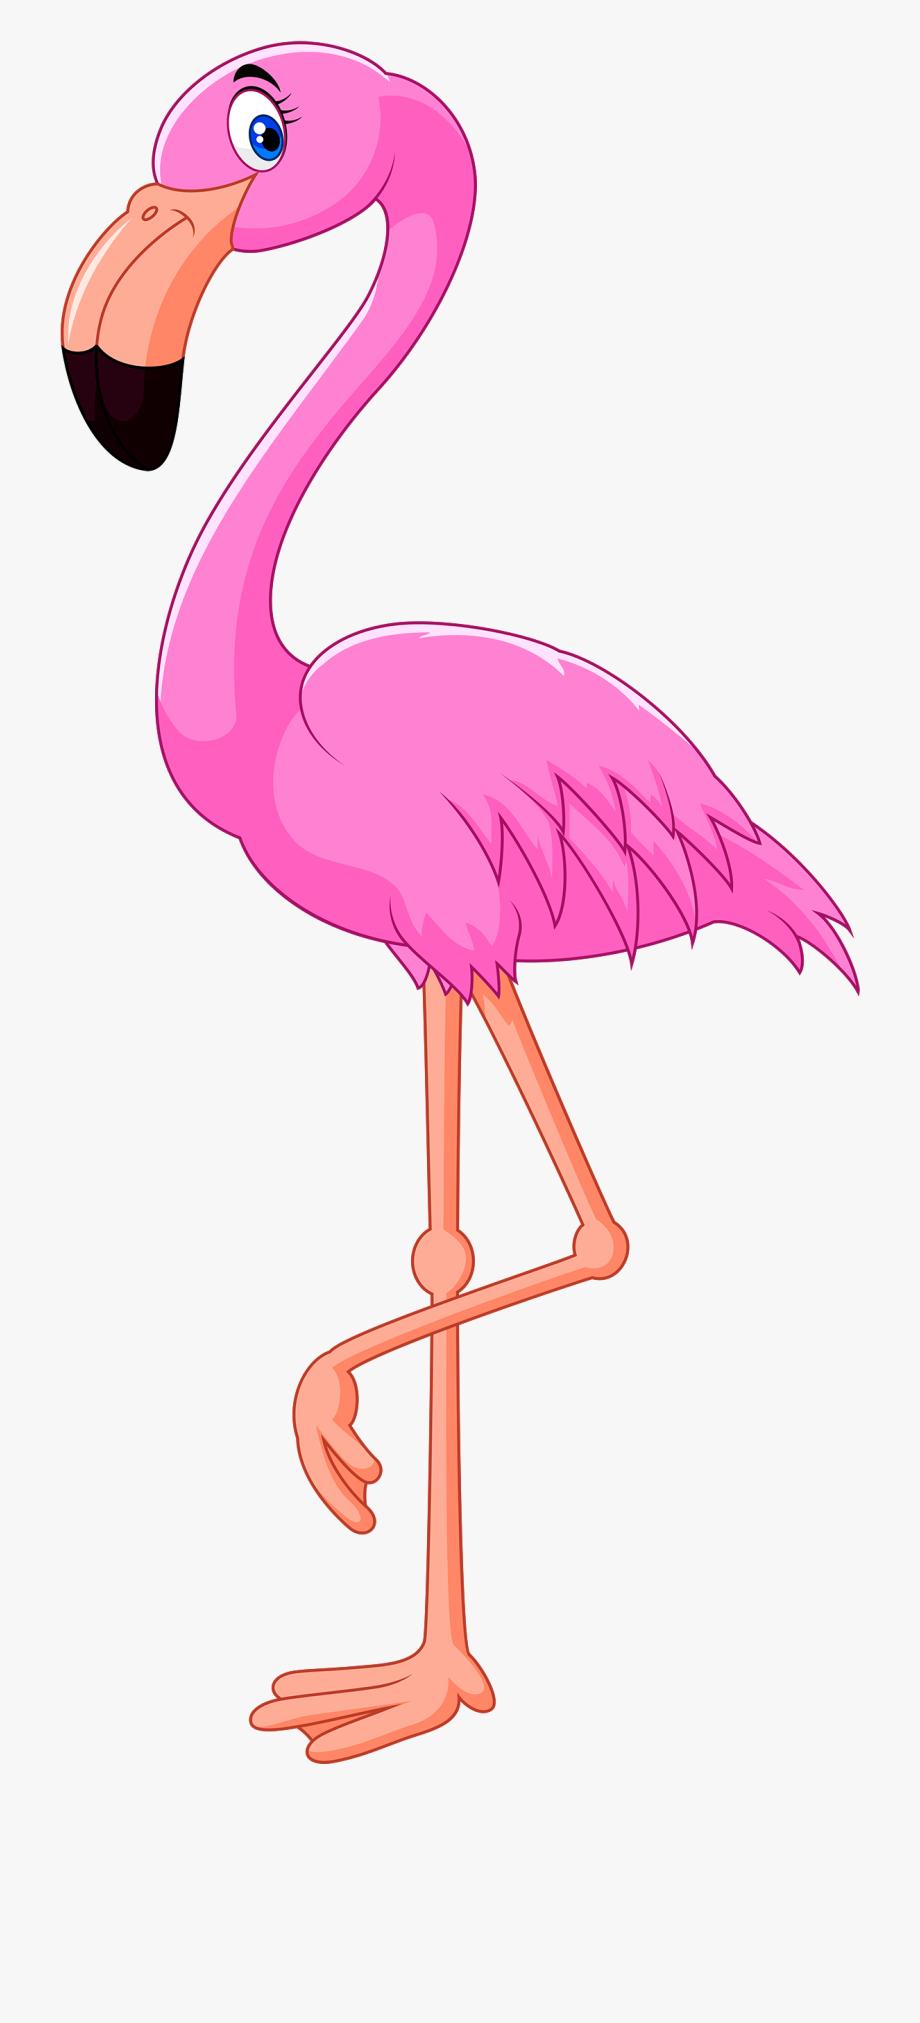 Flamingo clipart transparent background clip stock Flamingo Clipart Fire - Transparent Background Flamingo Png ... clip stock